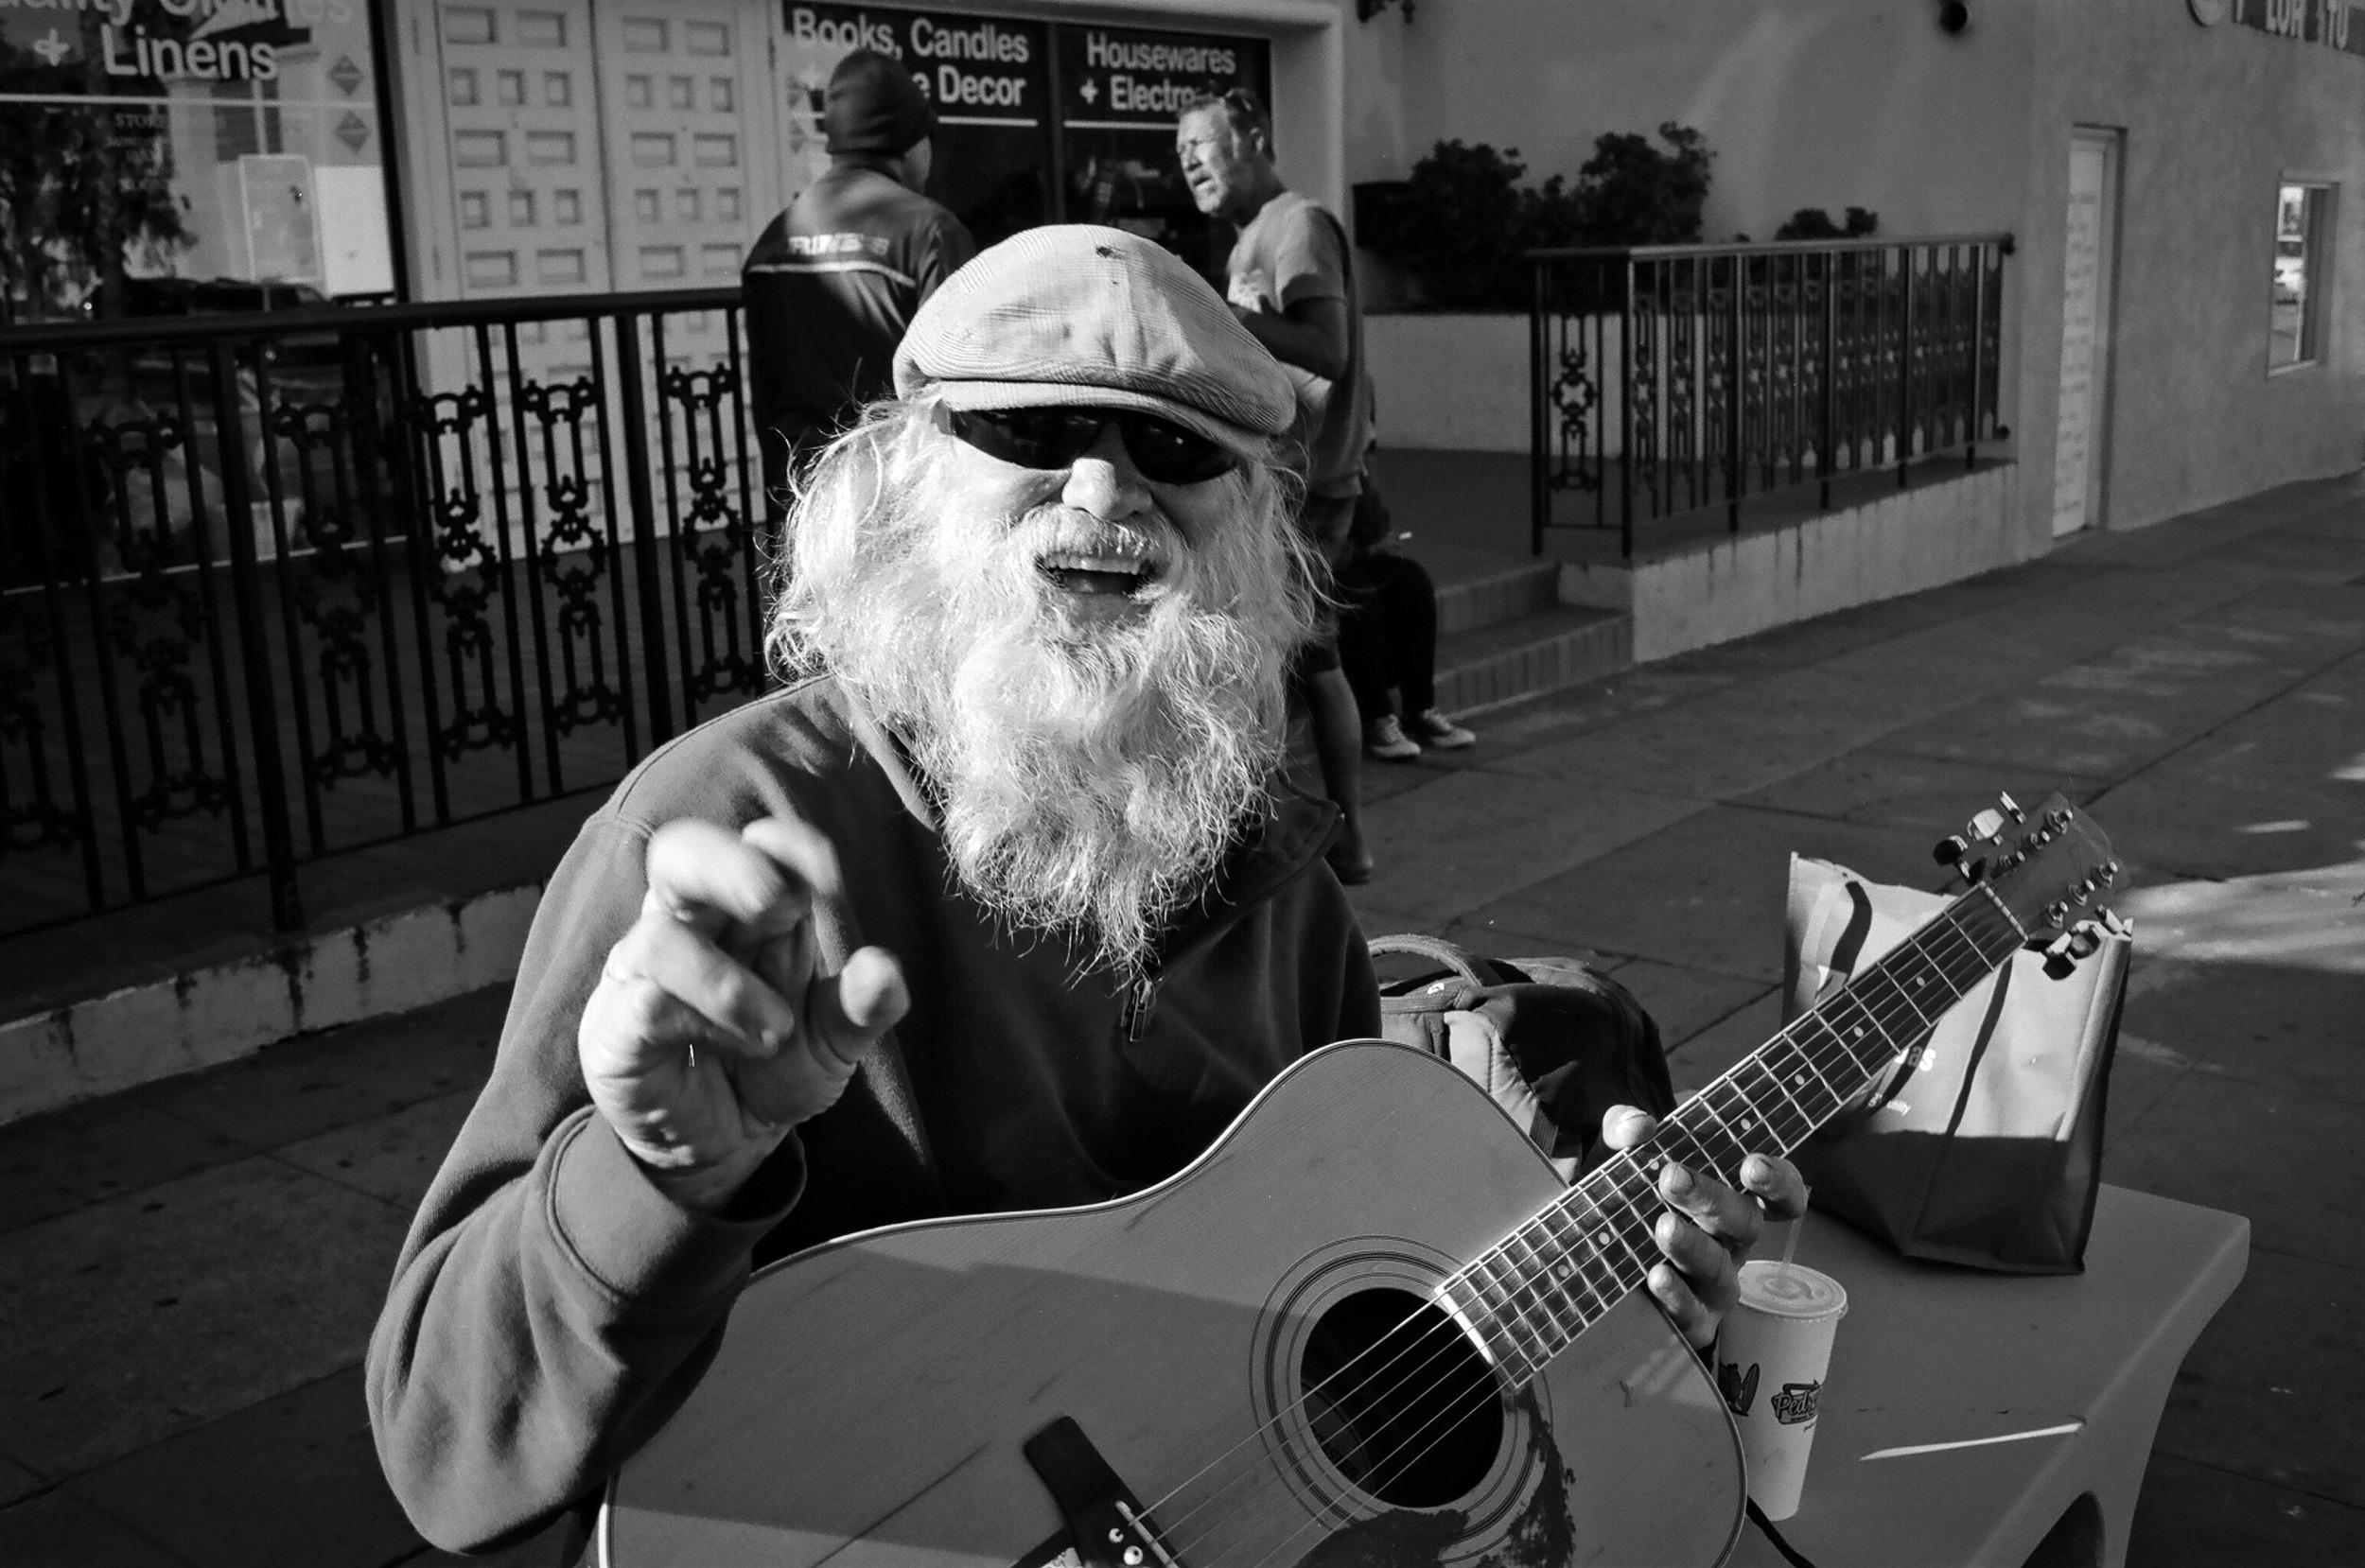 san-clemente-guitar-man-street-photography